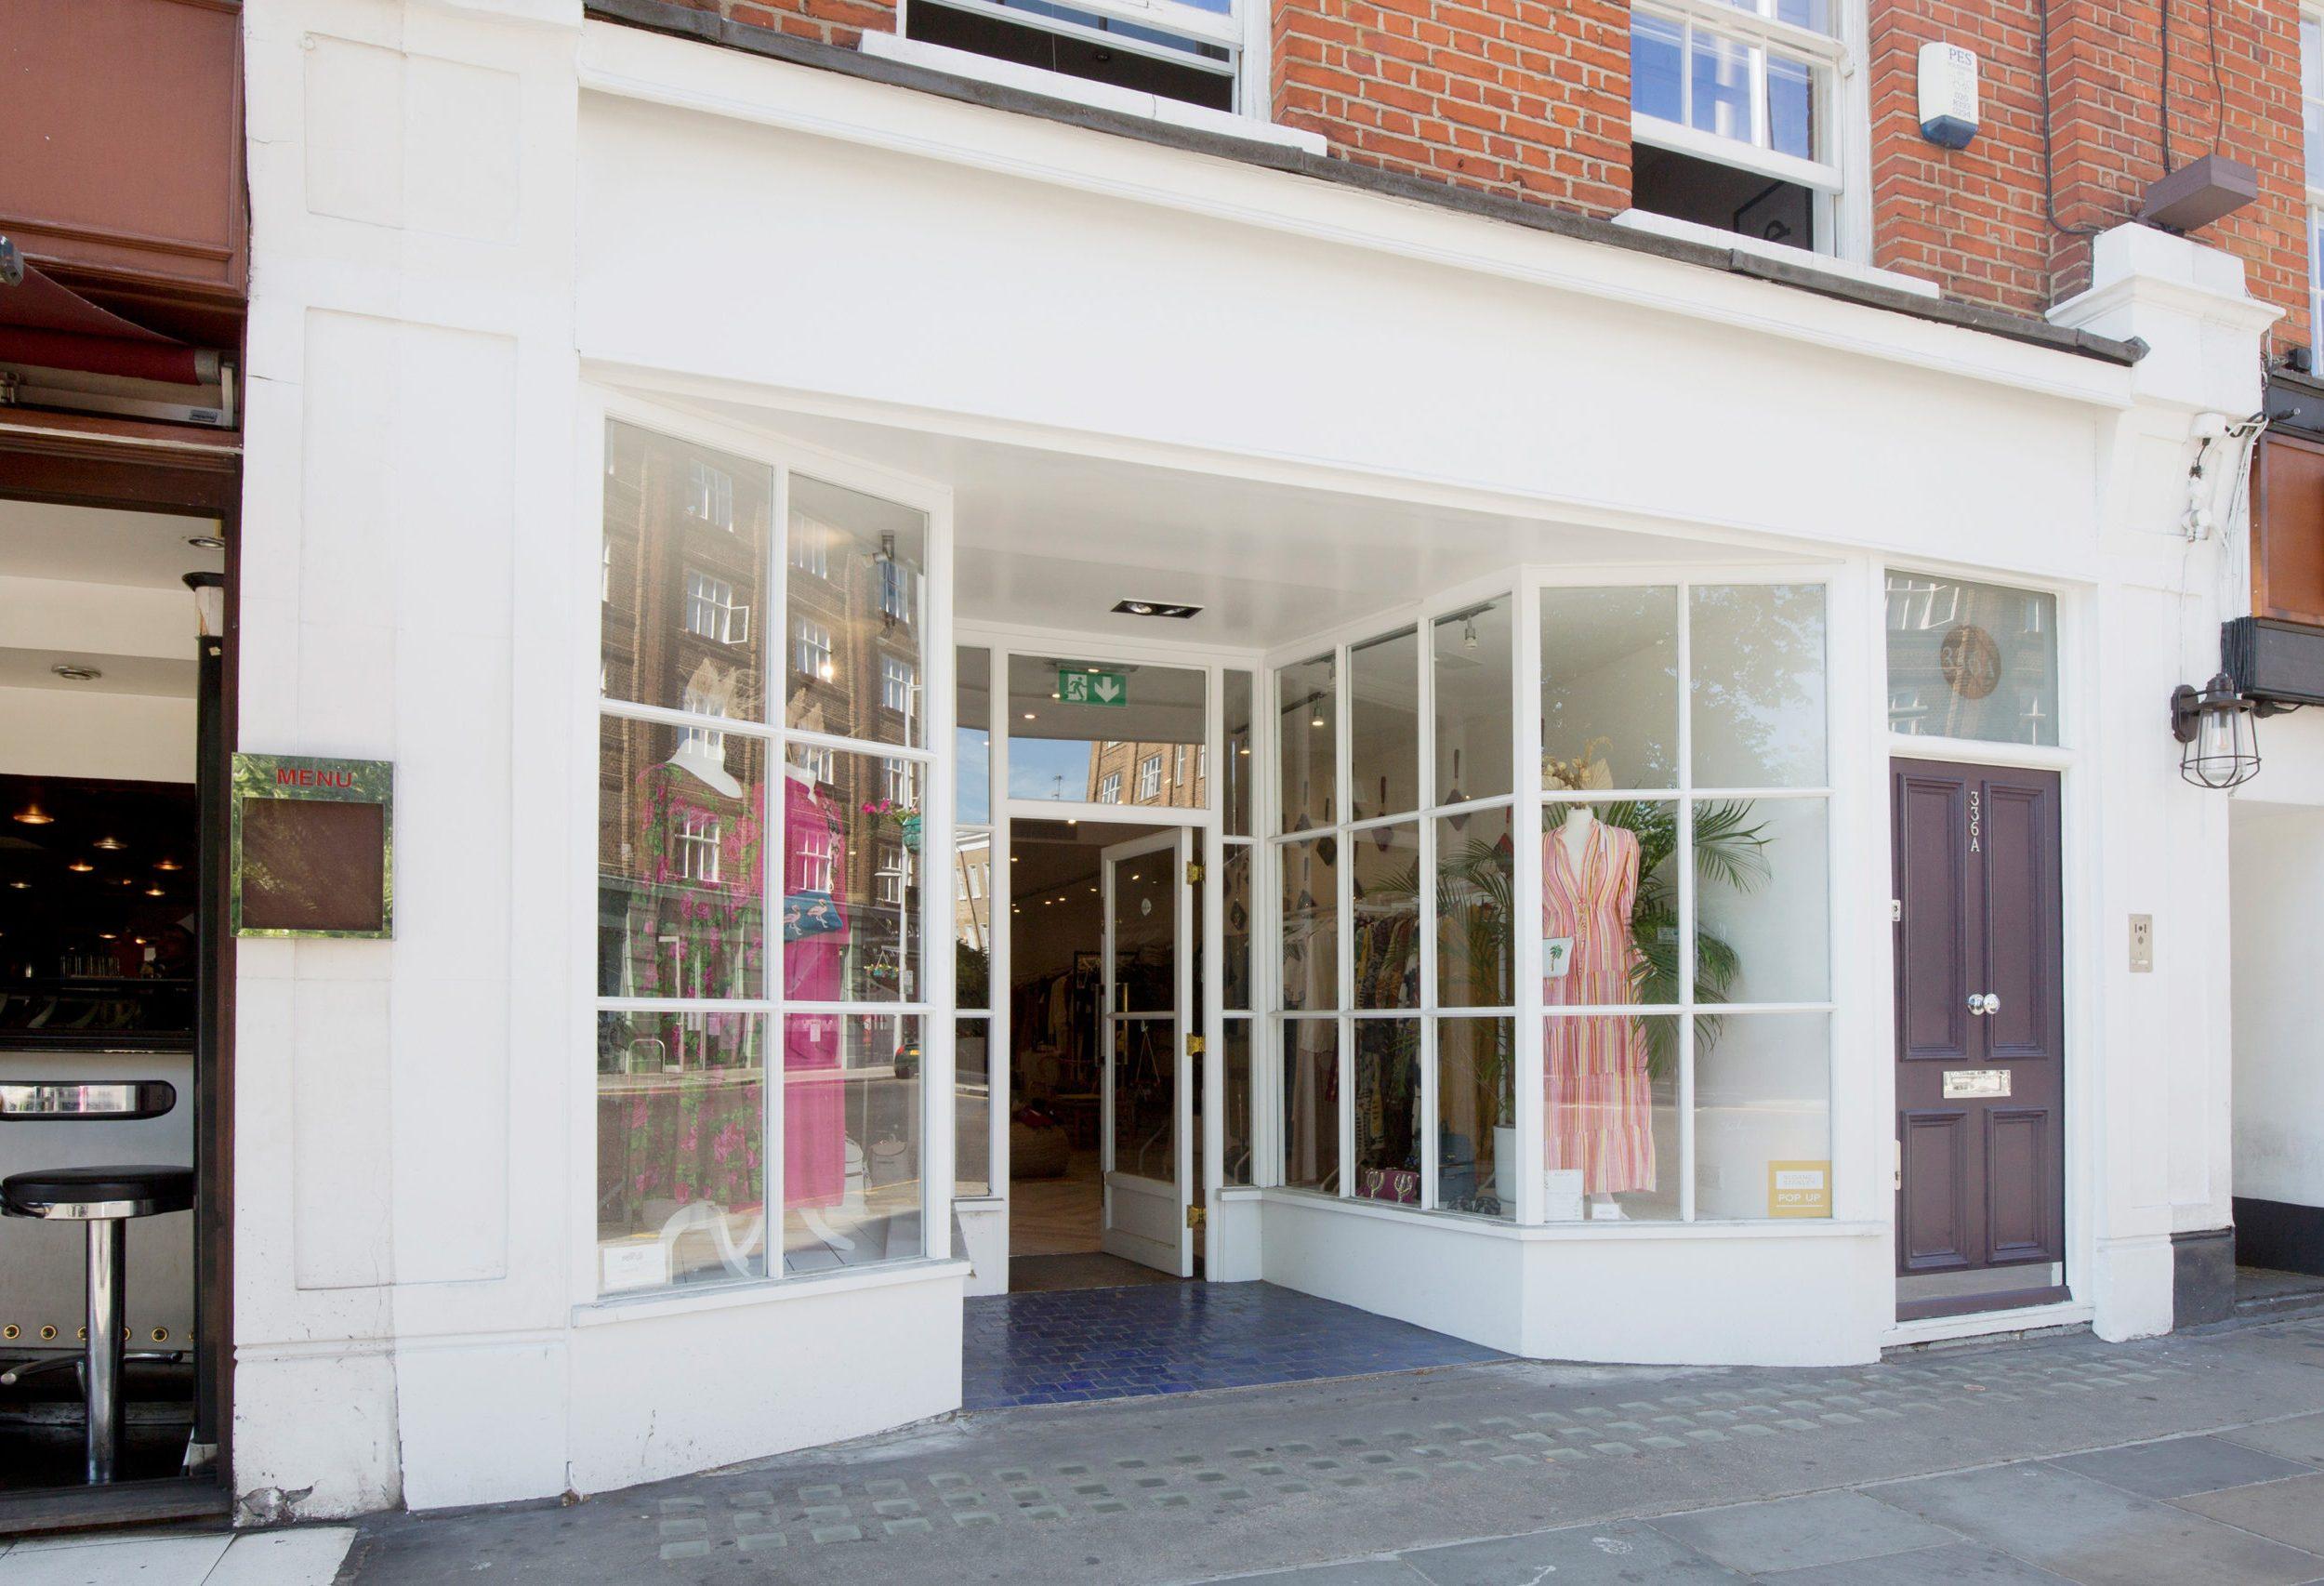 Exterior of shop at 336 King's Road